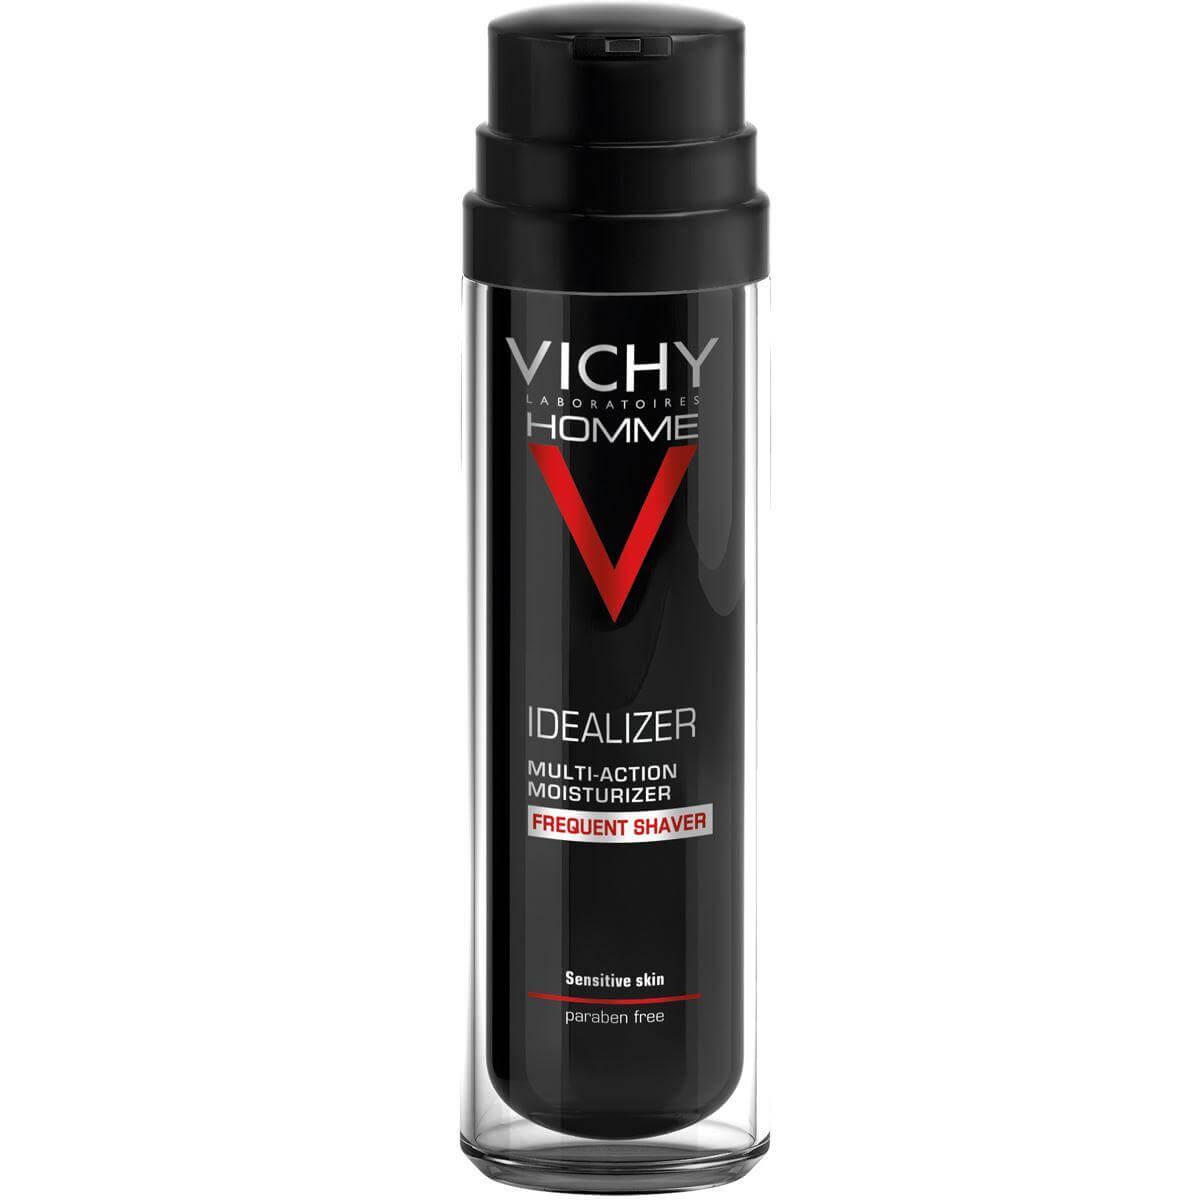 Vichy Homme Idealizer Multi Rasage Ενυδατική Κρέμα Πολλαπλών Δράσεων για Συχνό Ξύρισμα 50ml